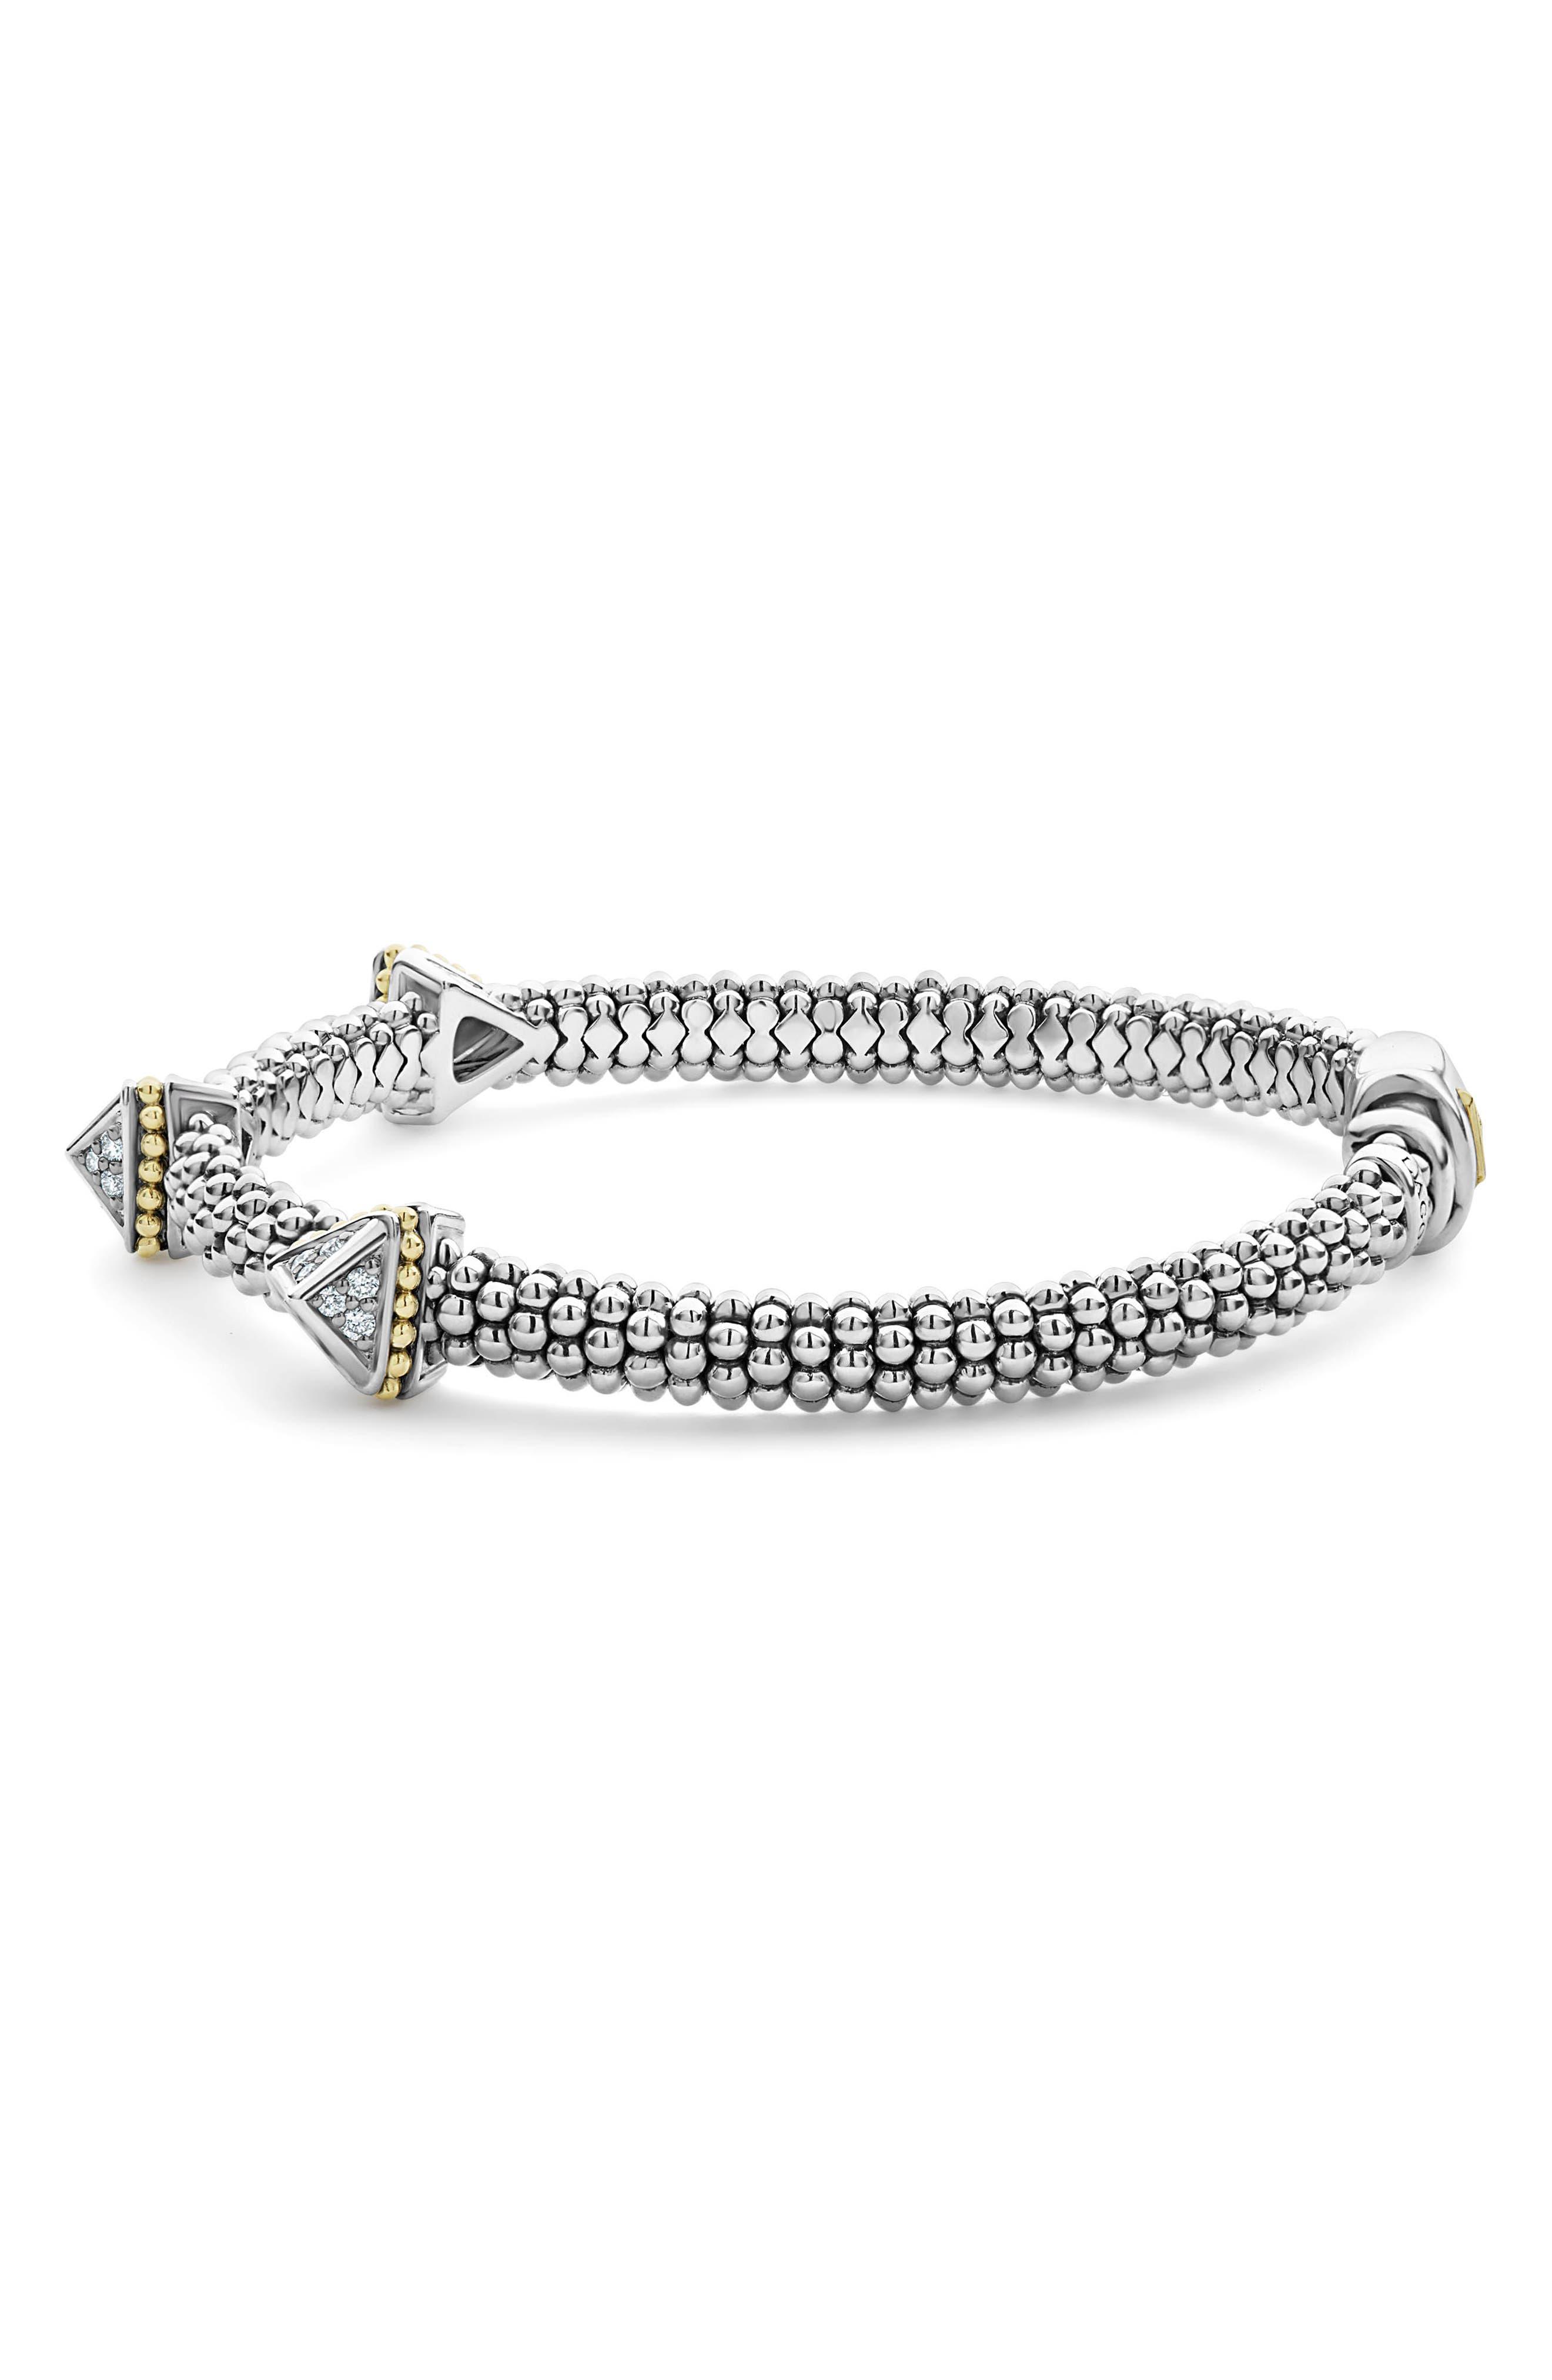 KSL Lux Diamond Pyramid Bracelet,                             Alternate thumbnail 4, color,                             SILVER/ DIAMOND